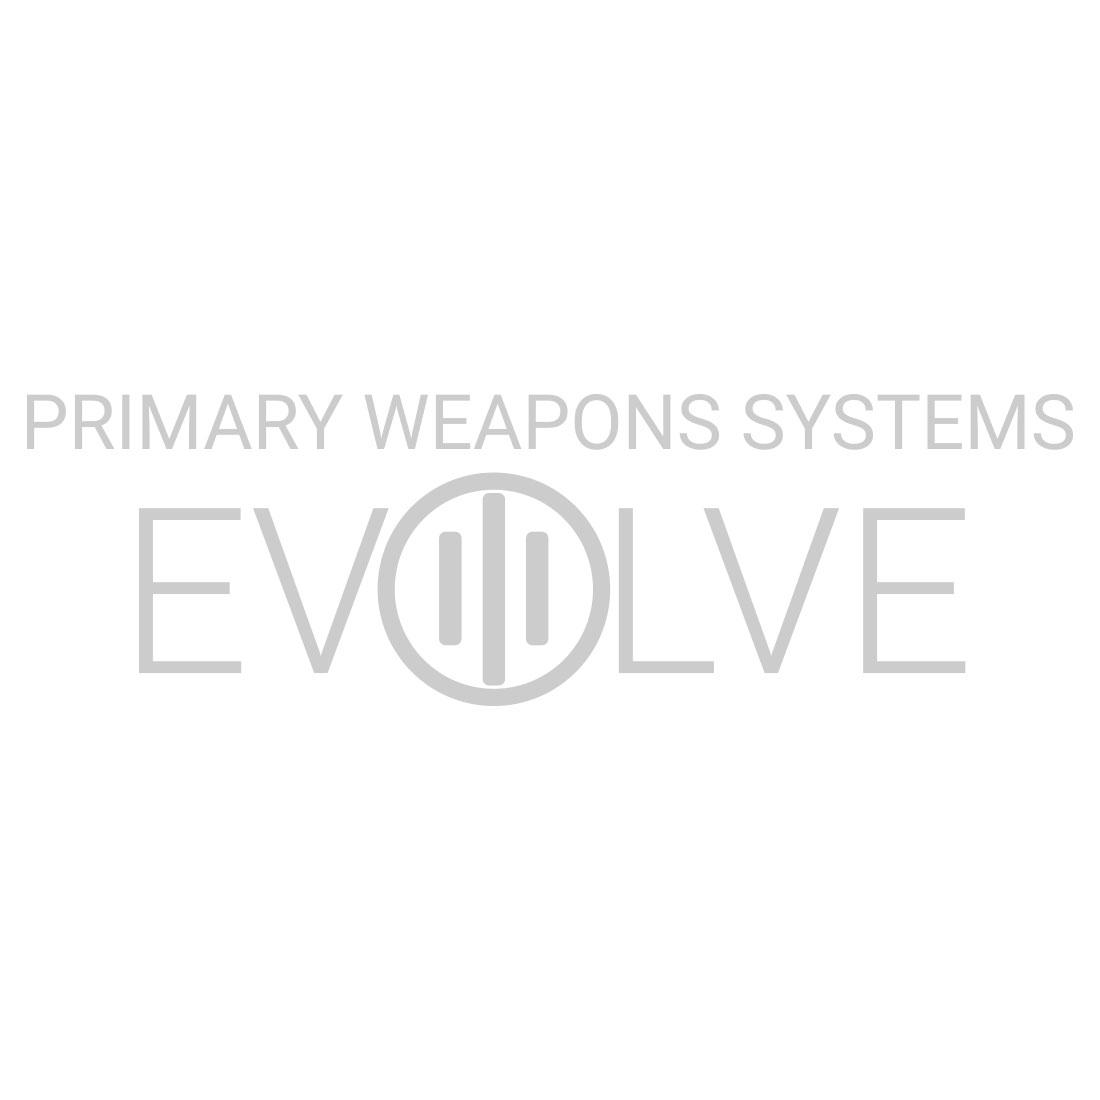 MK1 MOD 2-M Complete Rifle Lower